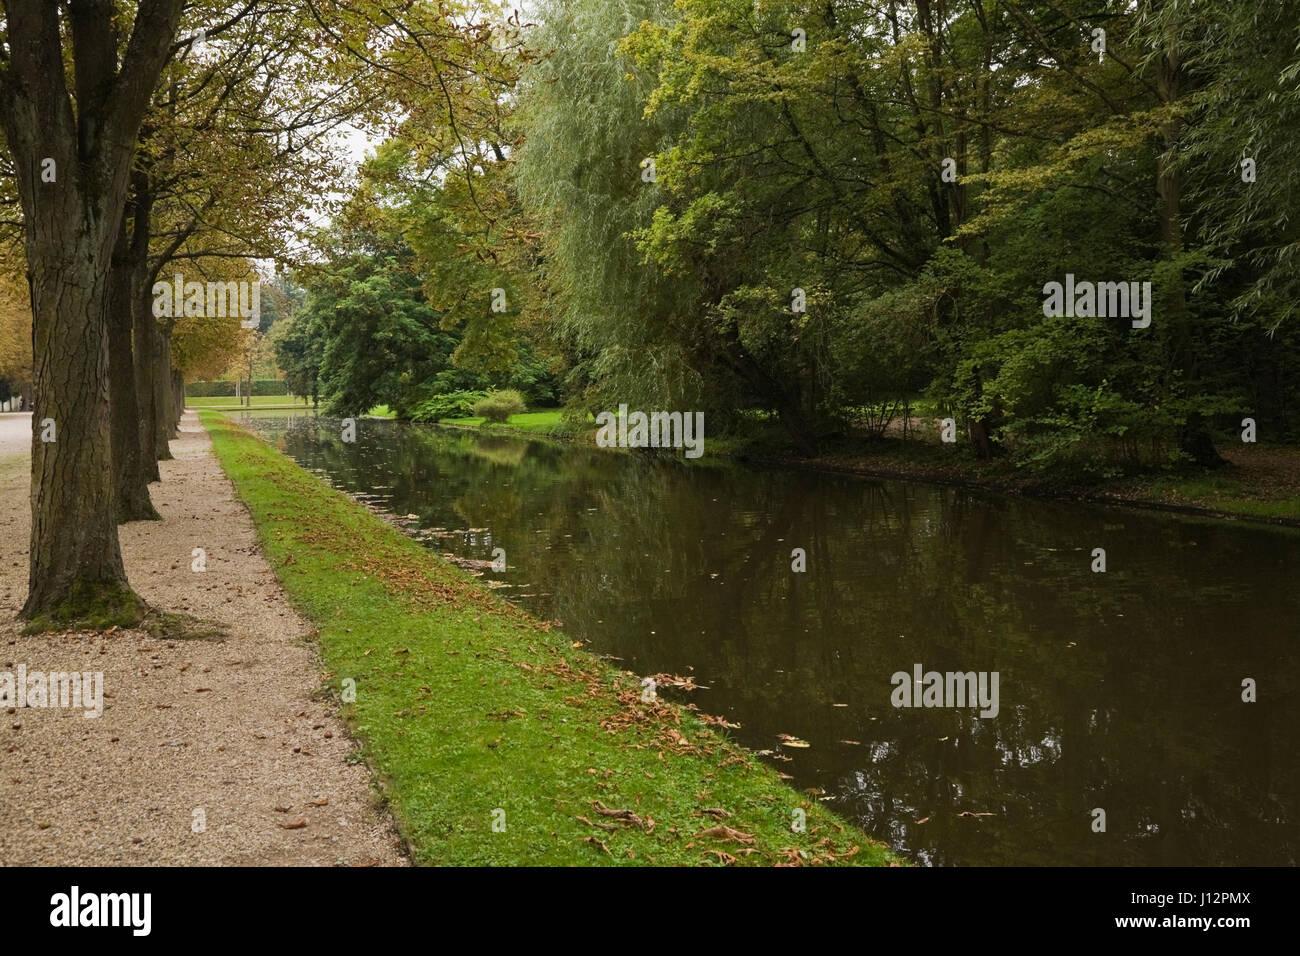 Water canal with row of deciduous trees in the Schwetzingen palace garden in late summer, Schwetzingen, Germany - Stock Image